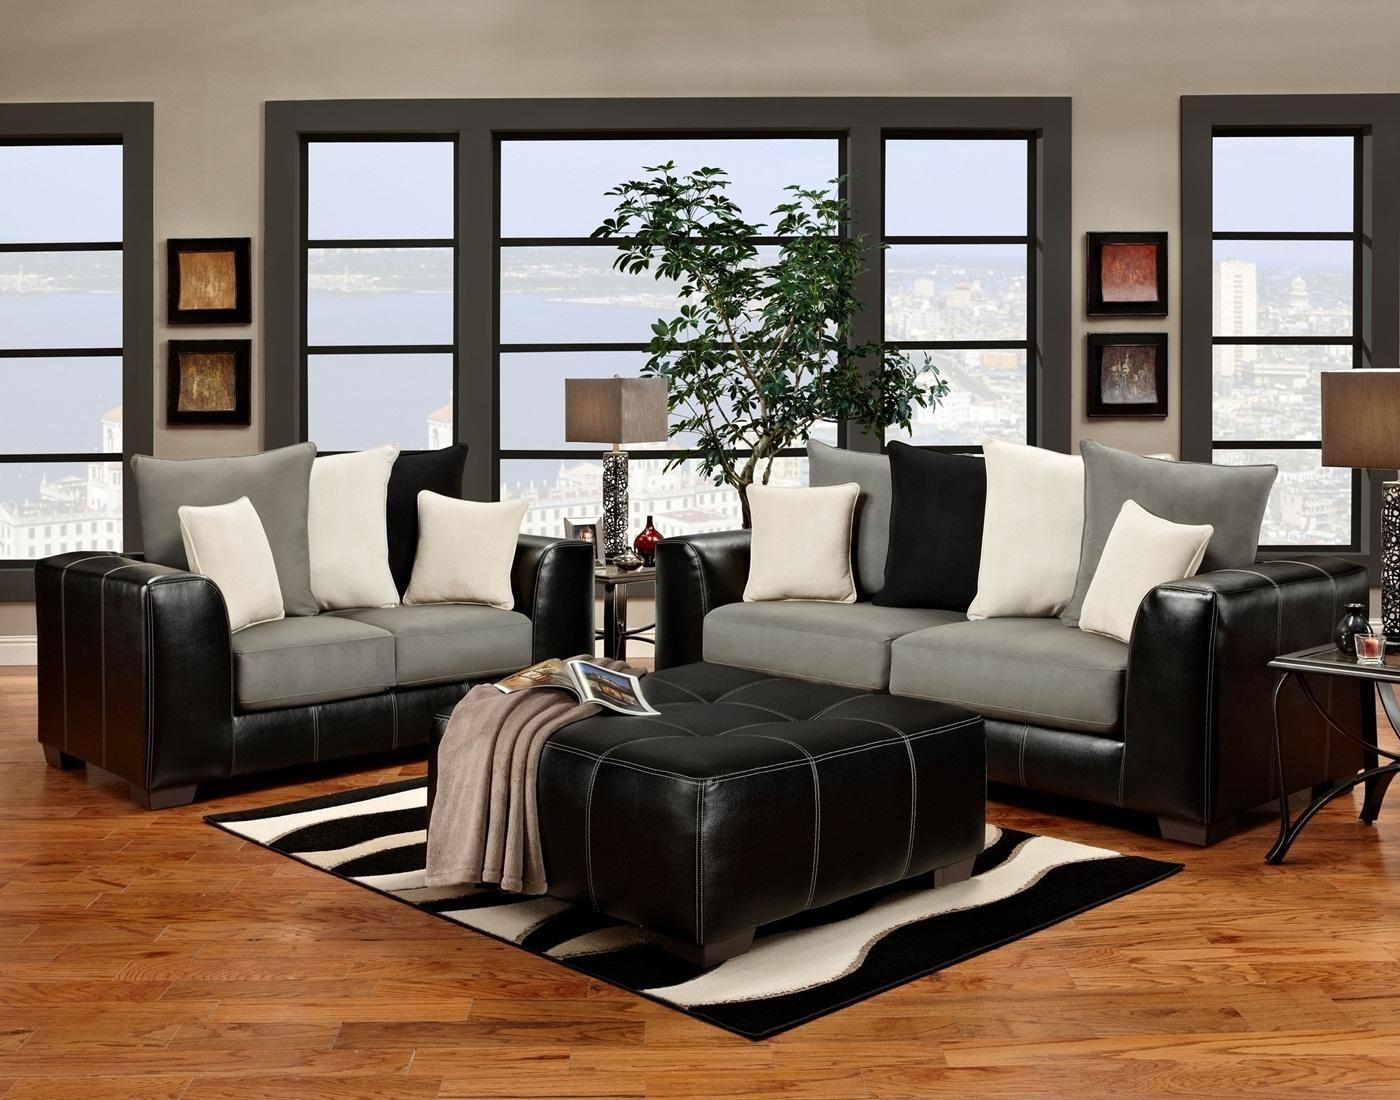 Idol Steel Sofa Freedom Furniture Electronics Sofa And Loveseat Set Mattress Furniture Couch Sofa Set